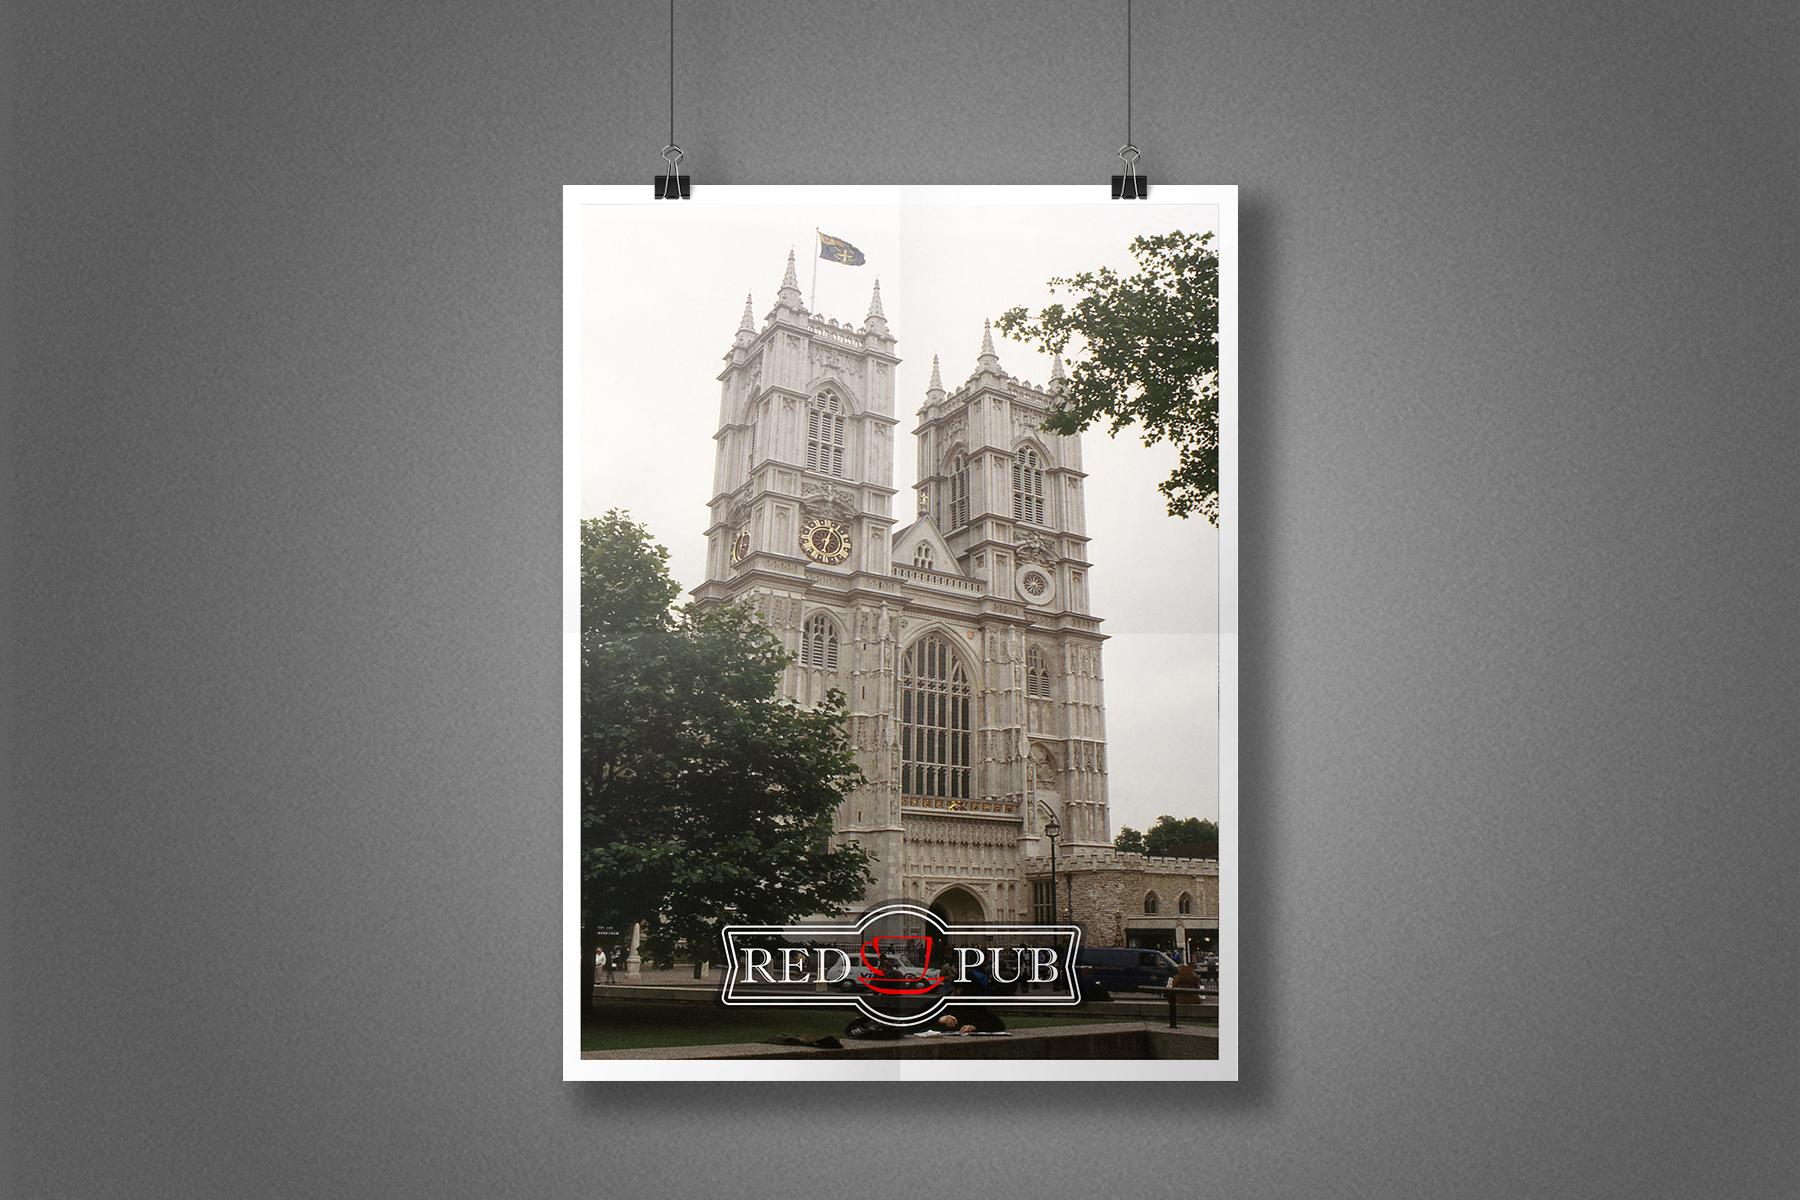 Плакат Red Cup Pub - Лондон, Вестминстерское аббатство